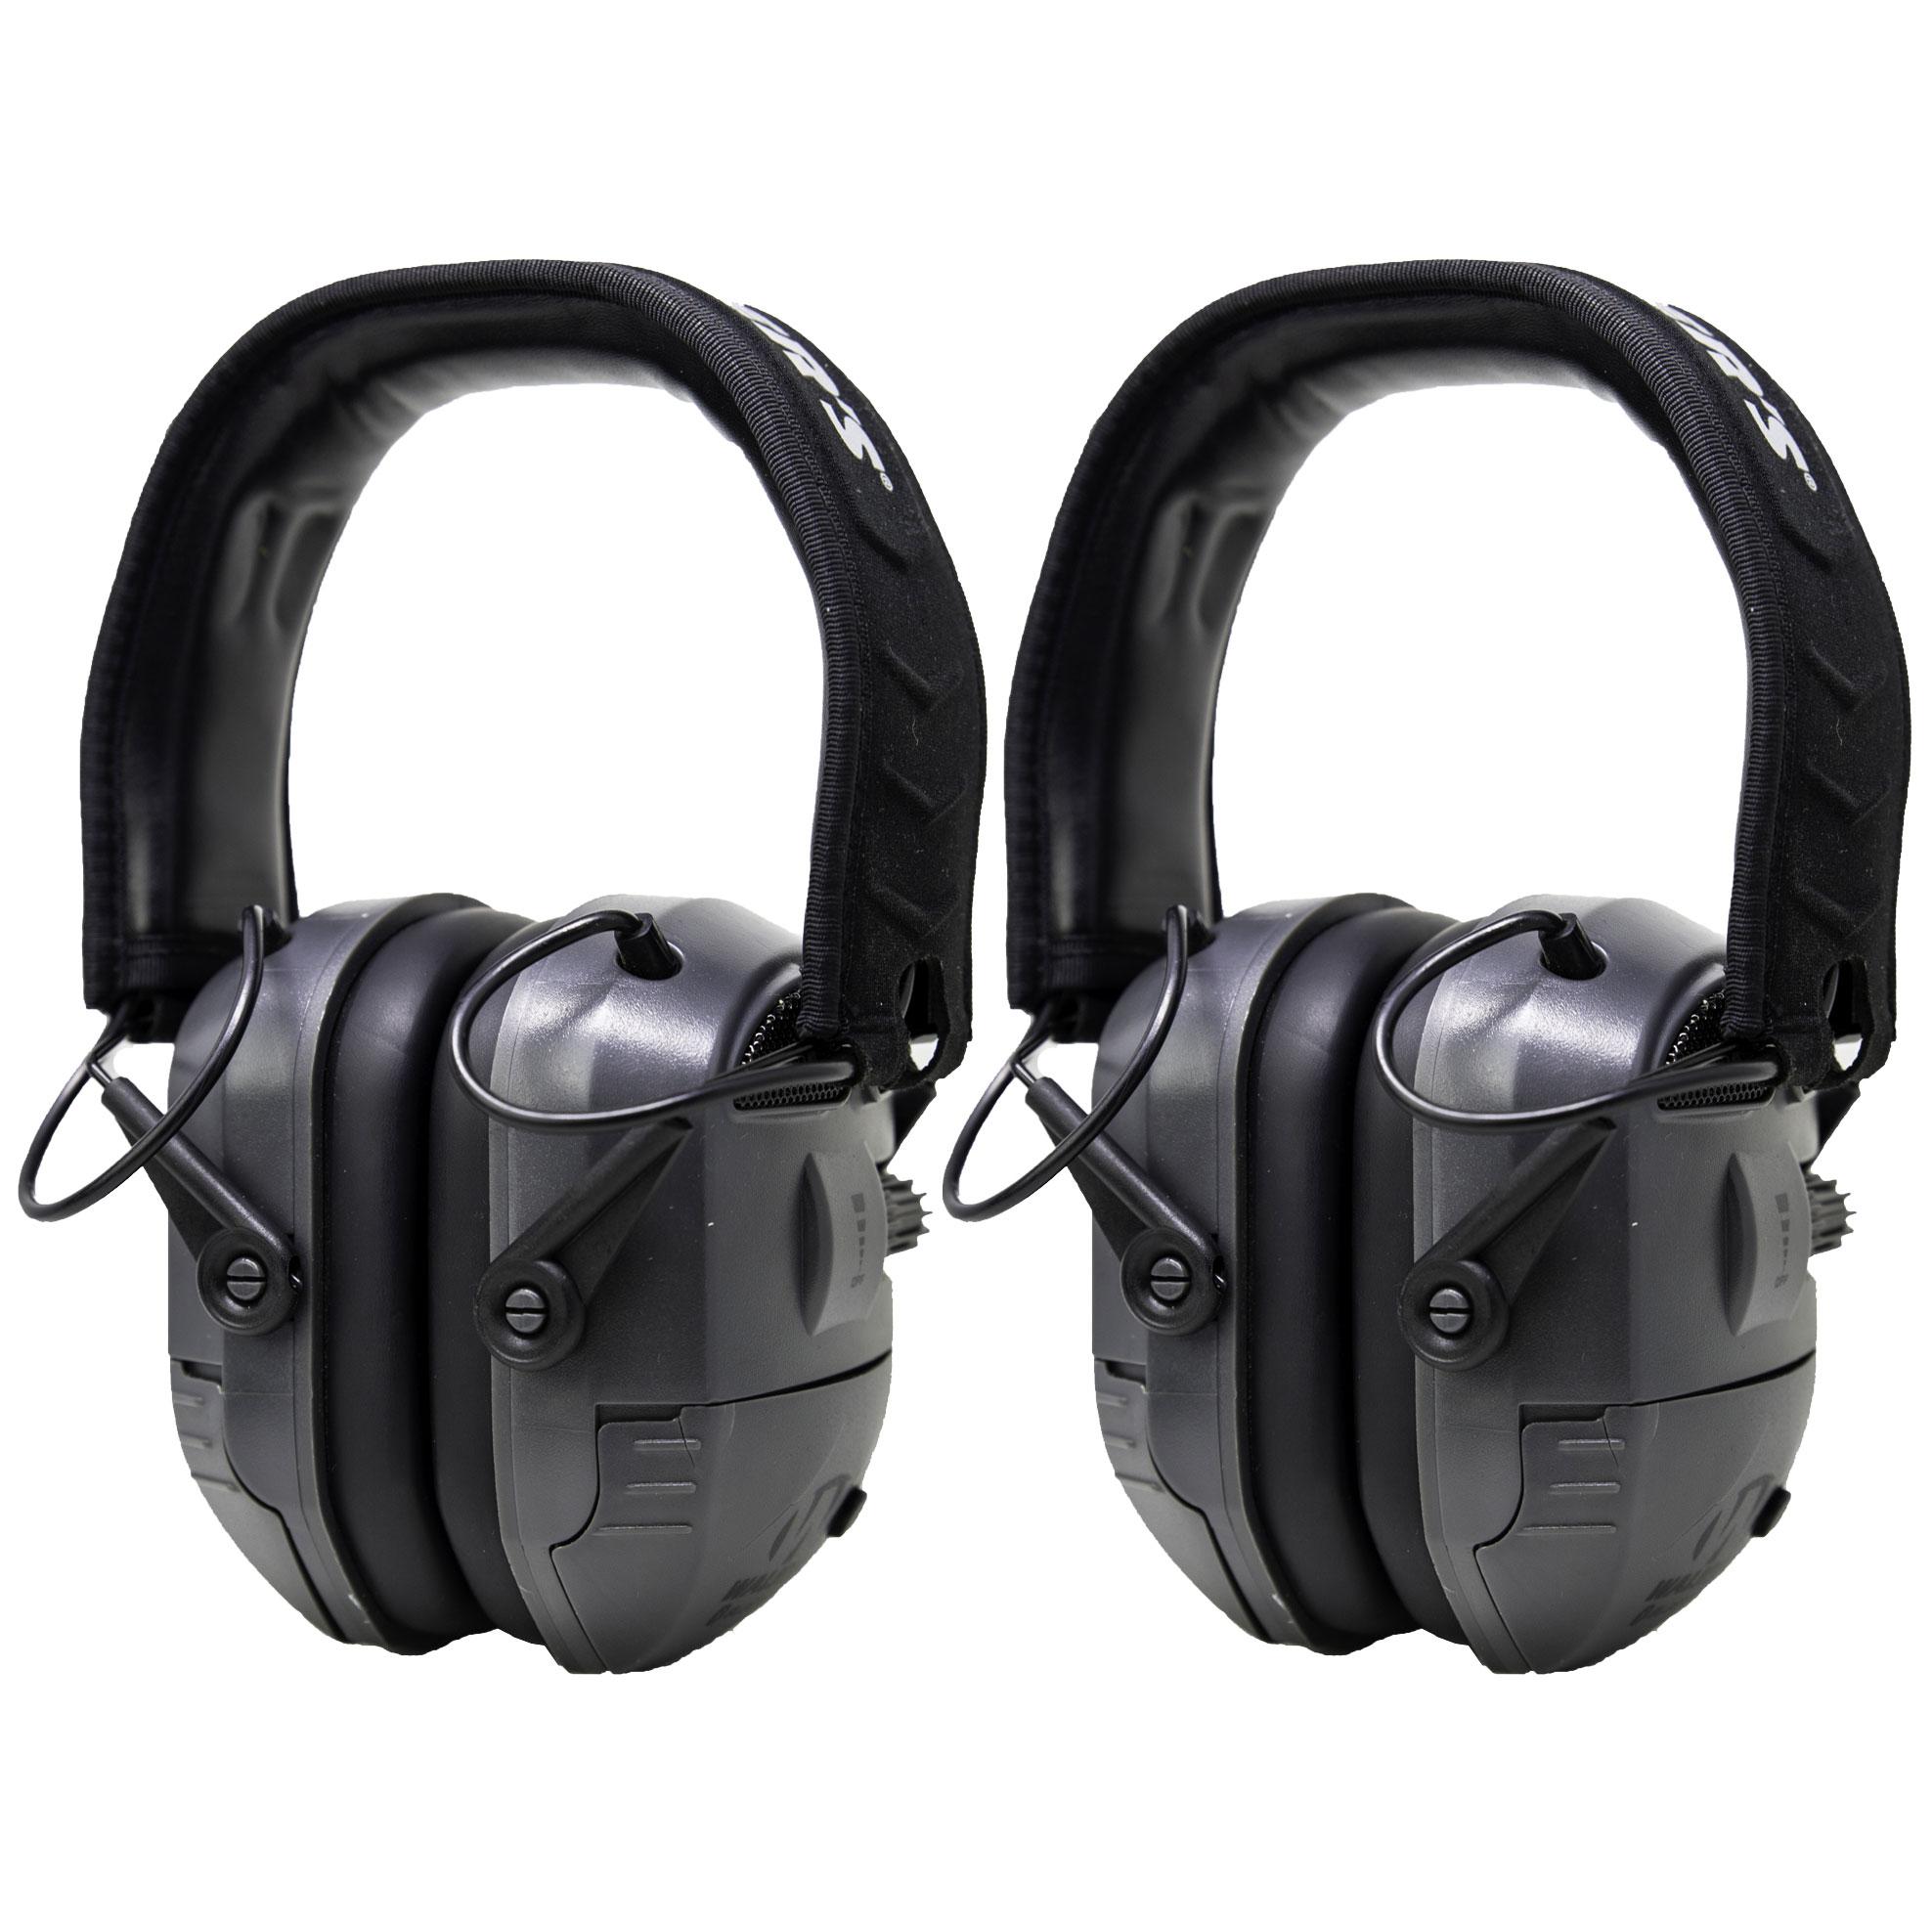 Walker's Game Digital Quad Hunting Ear Muffs (2 Pack) (Certified Refurbished)